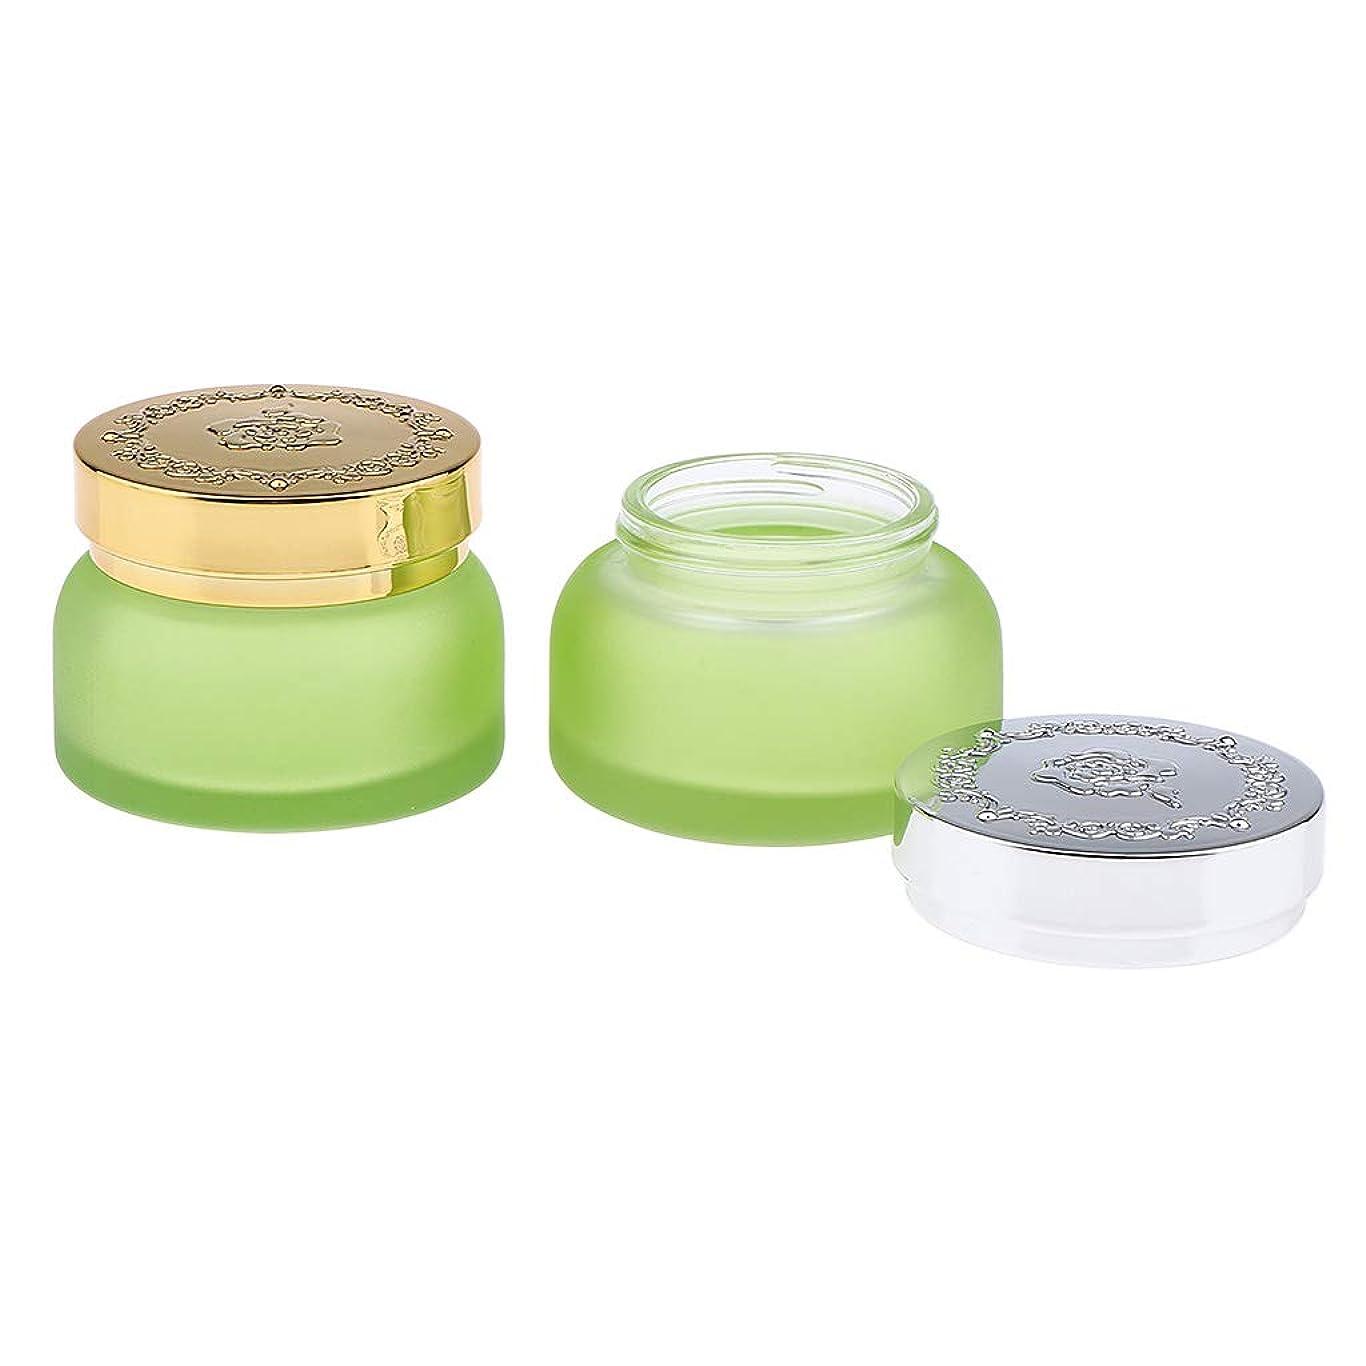 B Baosity 2個 フェイスクリーム 化粧品容器 ボトル ジャー ポット ポータブル 3タイプ選べ - 50gライトグリーン